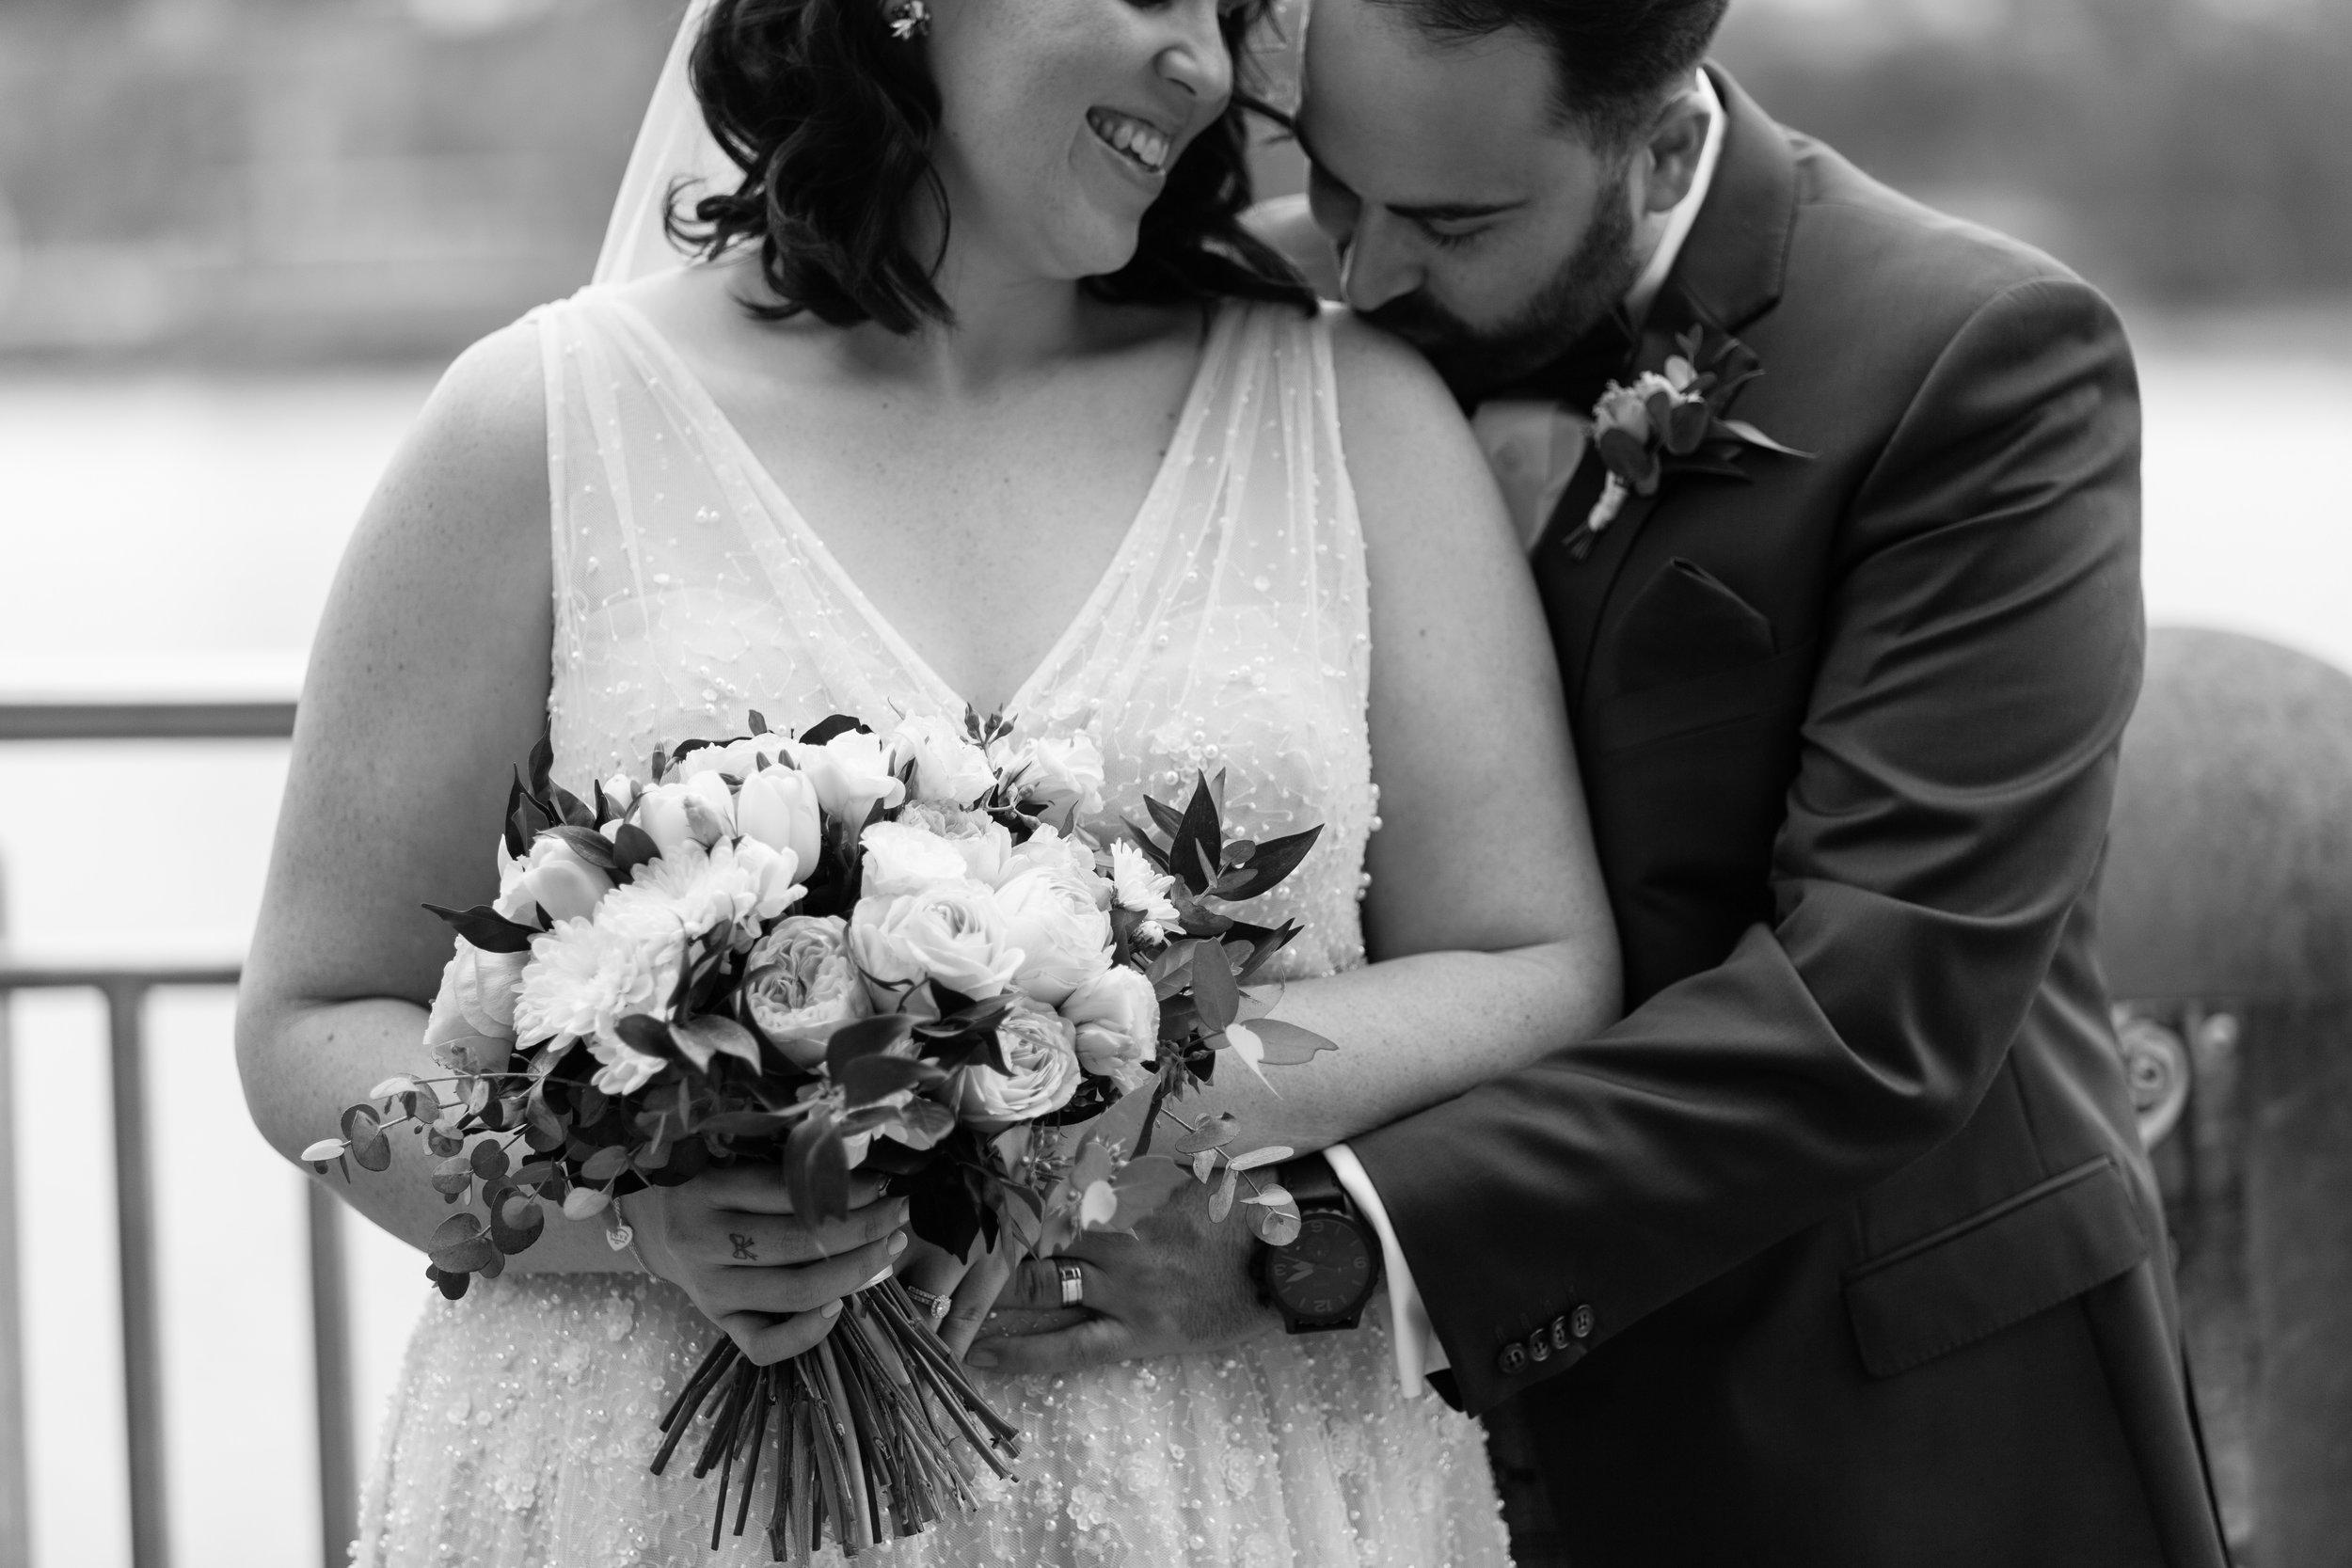 brisbane-city-wedding-photographer-romantic-wedding-60.jpg